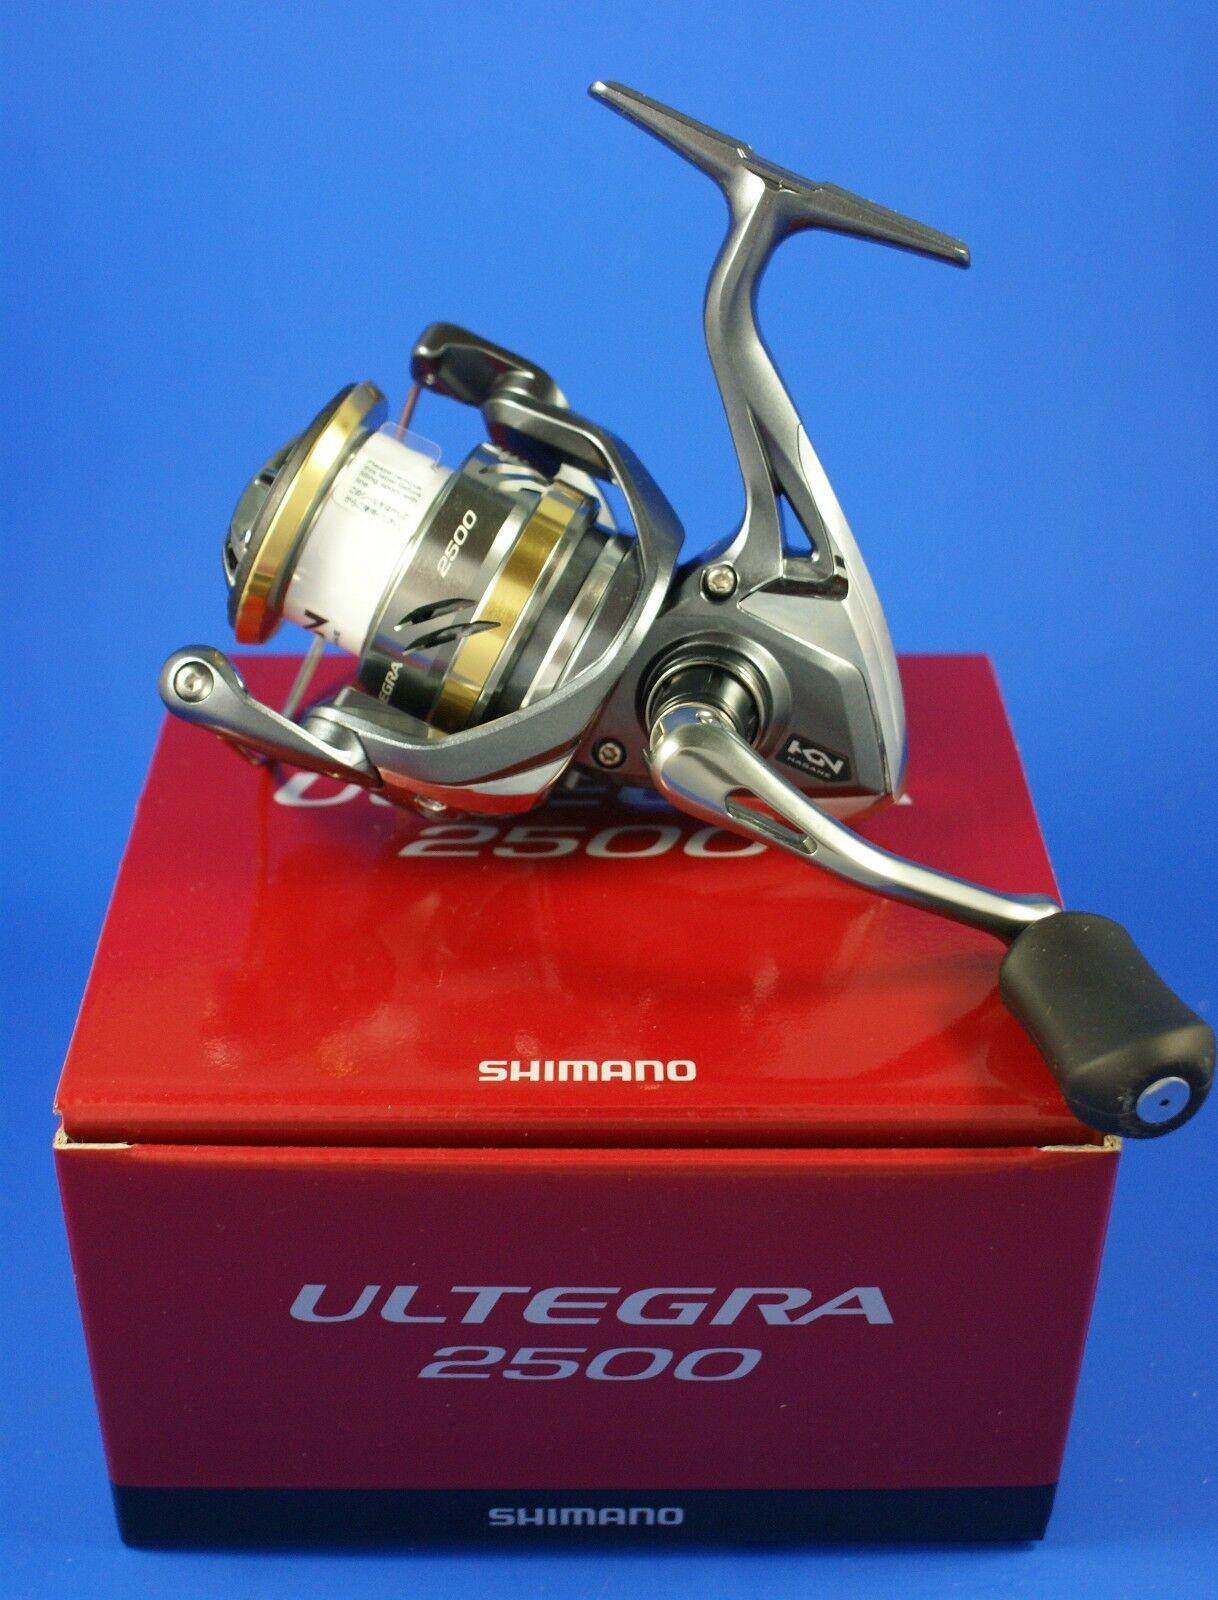 Shimano Ultegra 2500 FB    ULT2500FB    Front Drag Fishing Reel